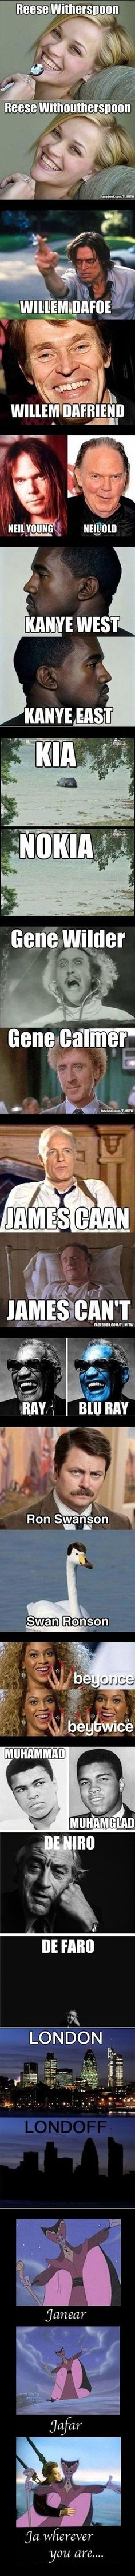 Funny celebrity pun photo strip